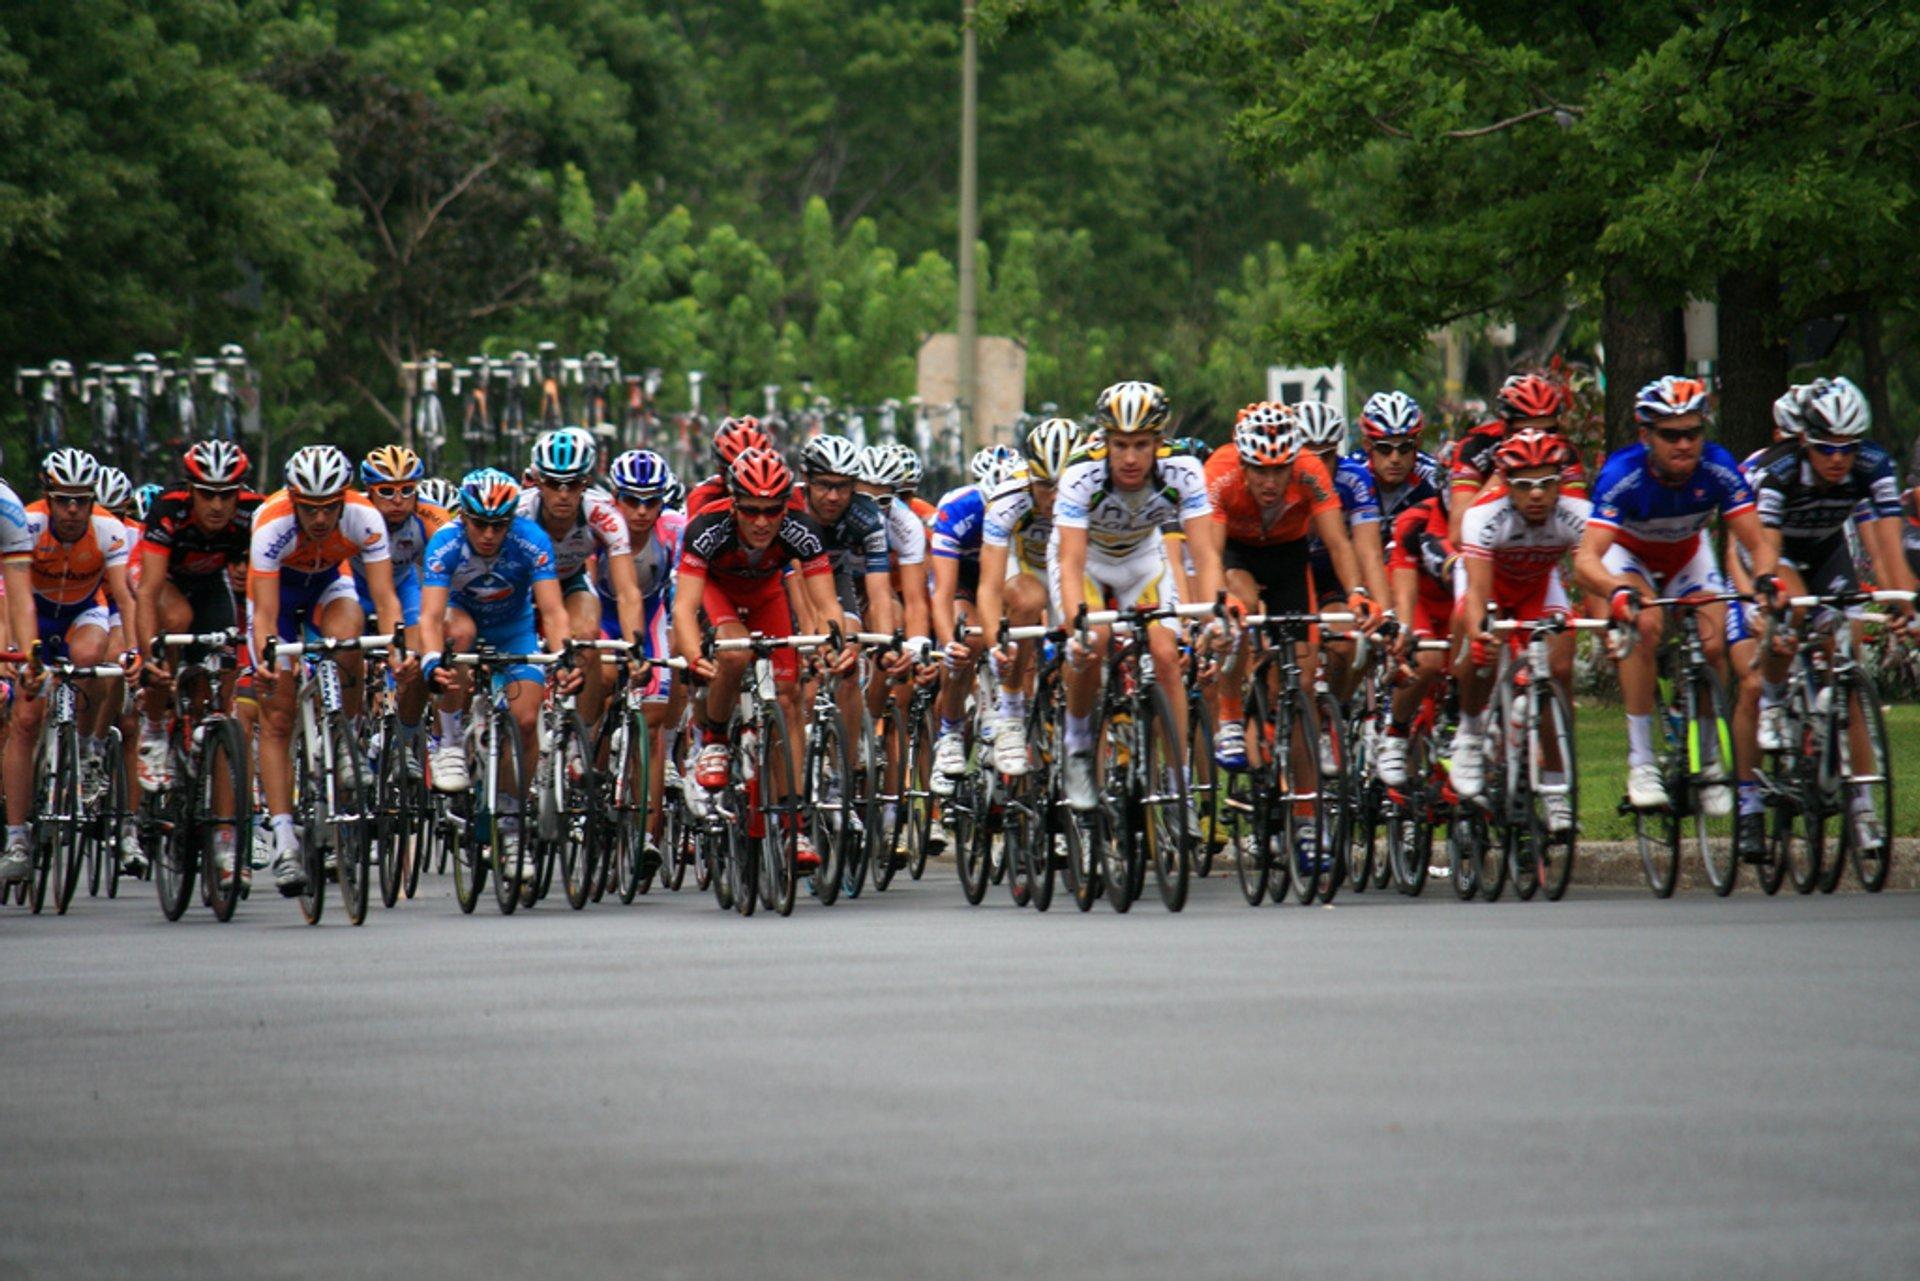 Grands Prix Cyclistes in Quebec - Best Season 2020